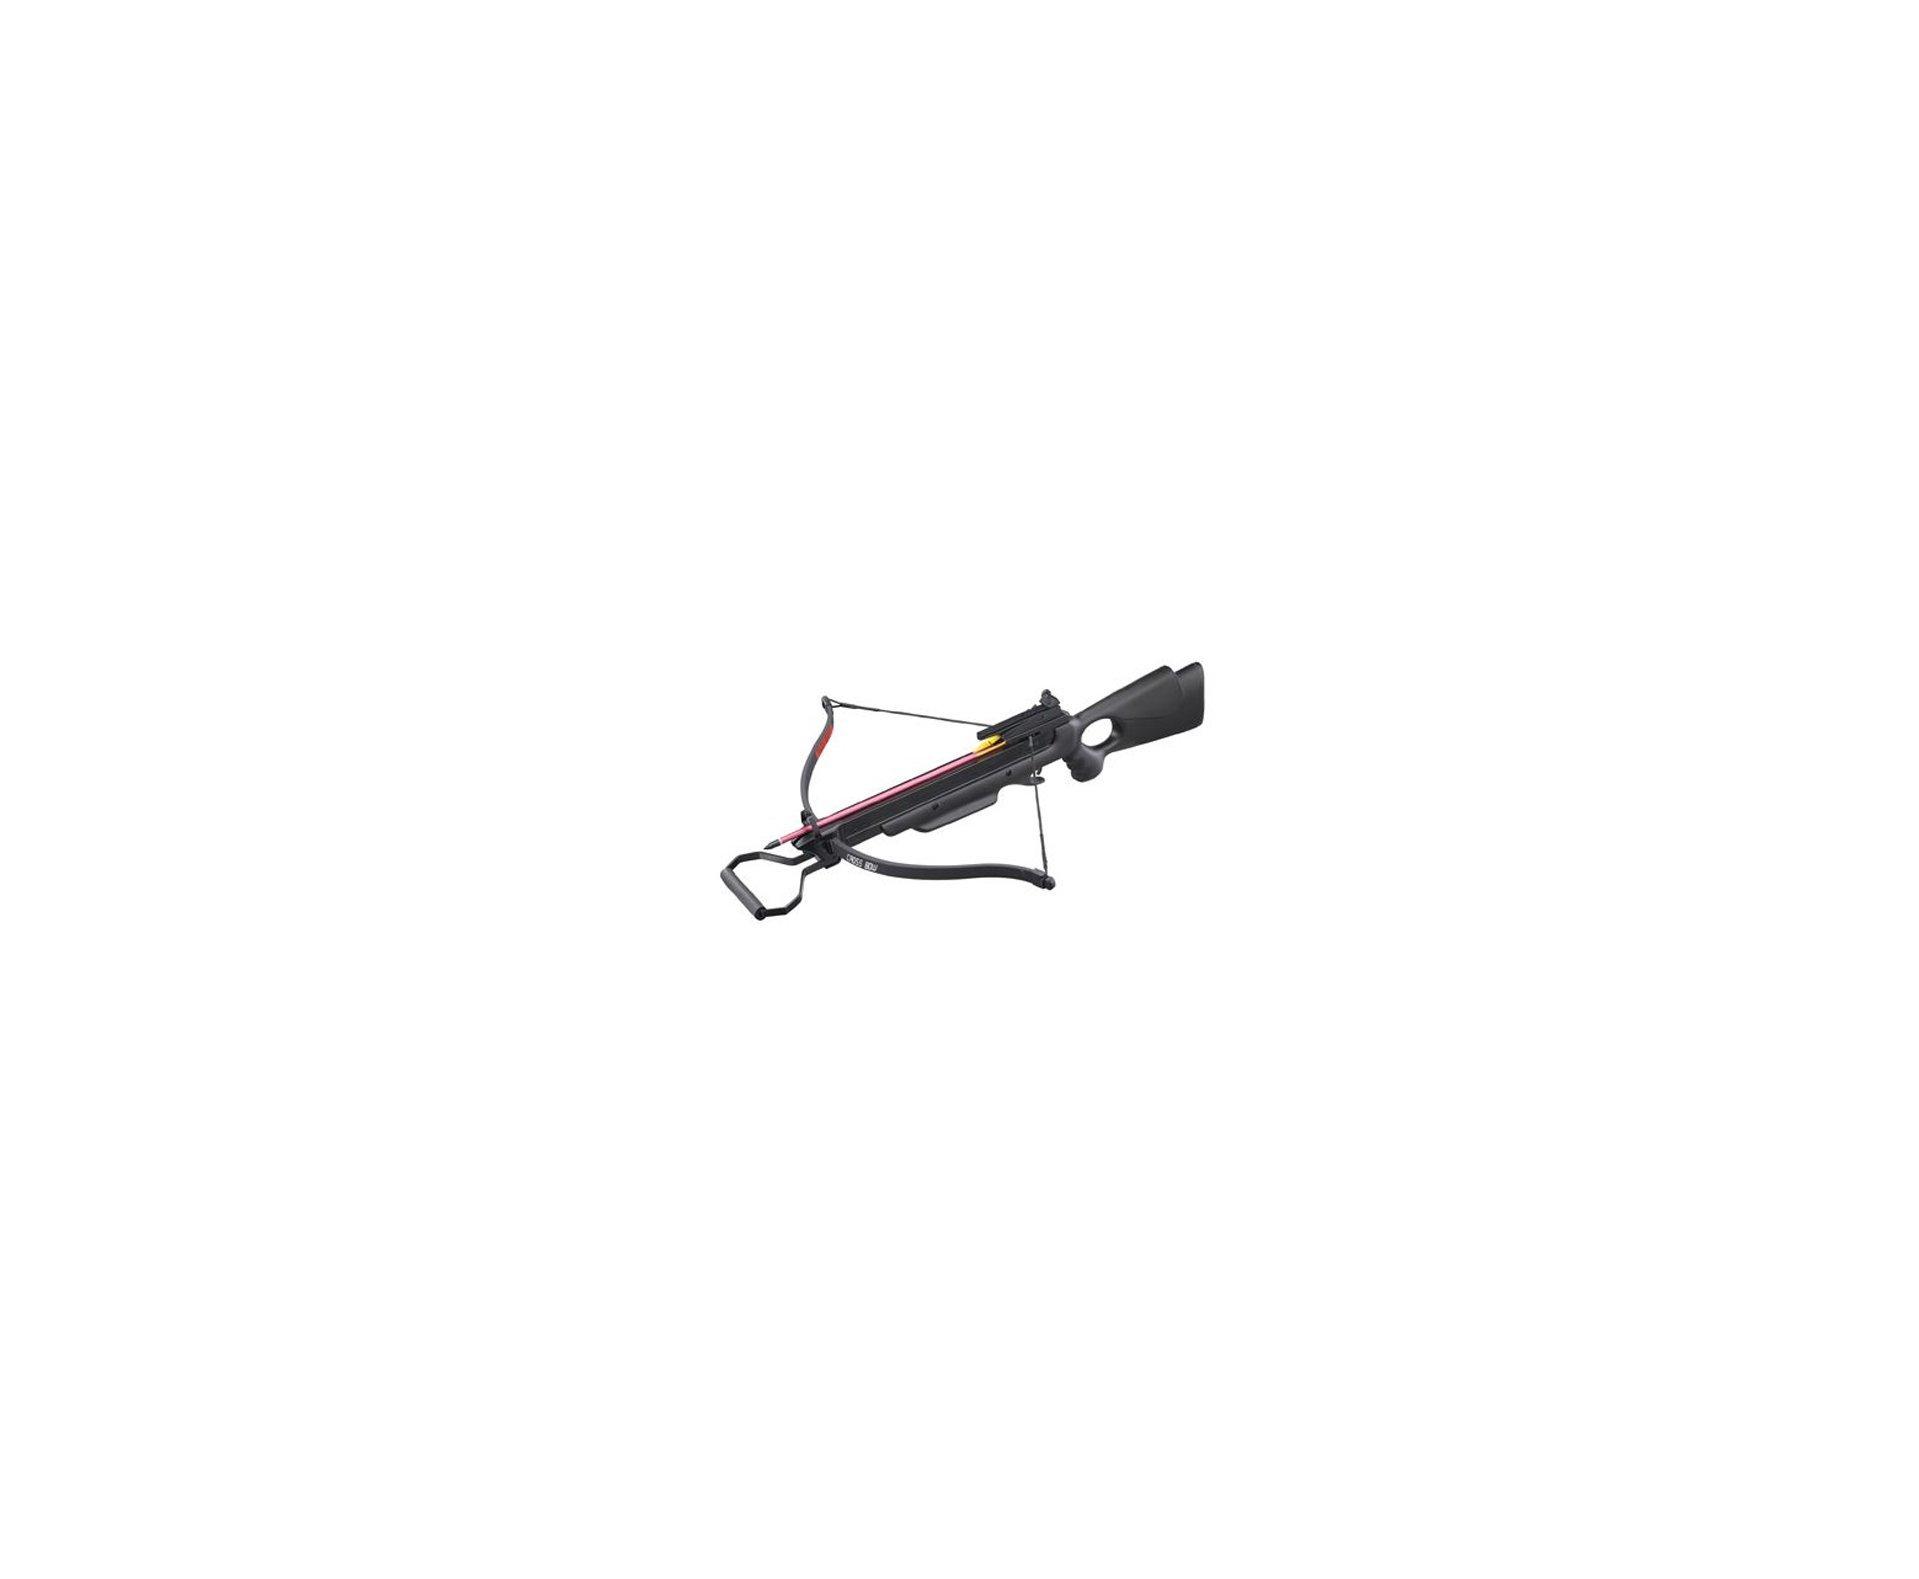 Besta/balestra Recurvo Black - 150 Lbs - Man Kung